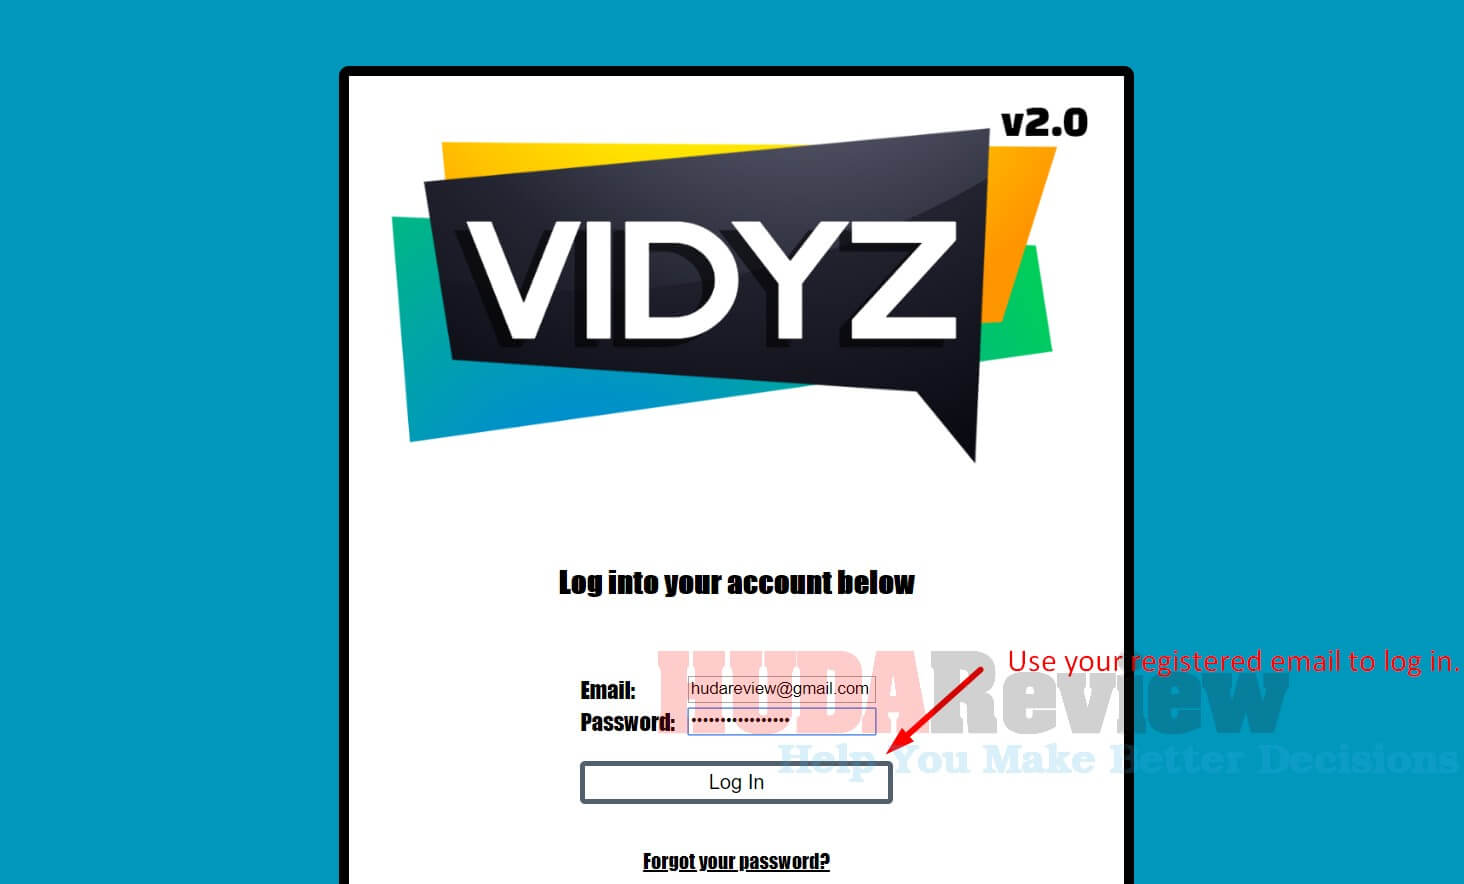 Vidyz-2-Step-1-1